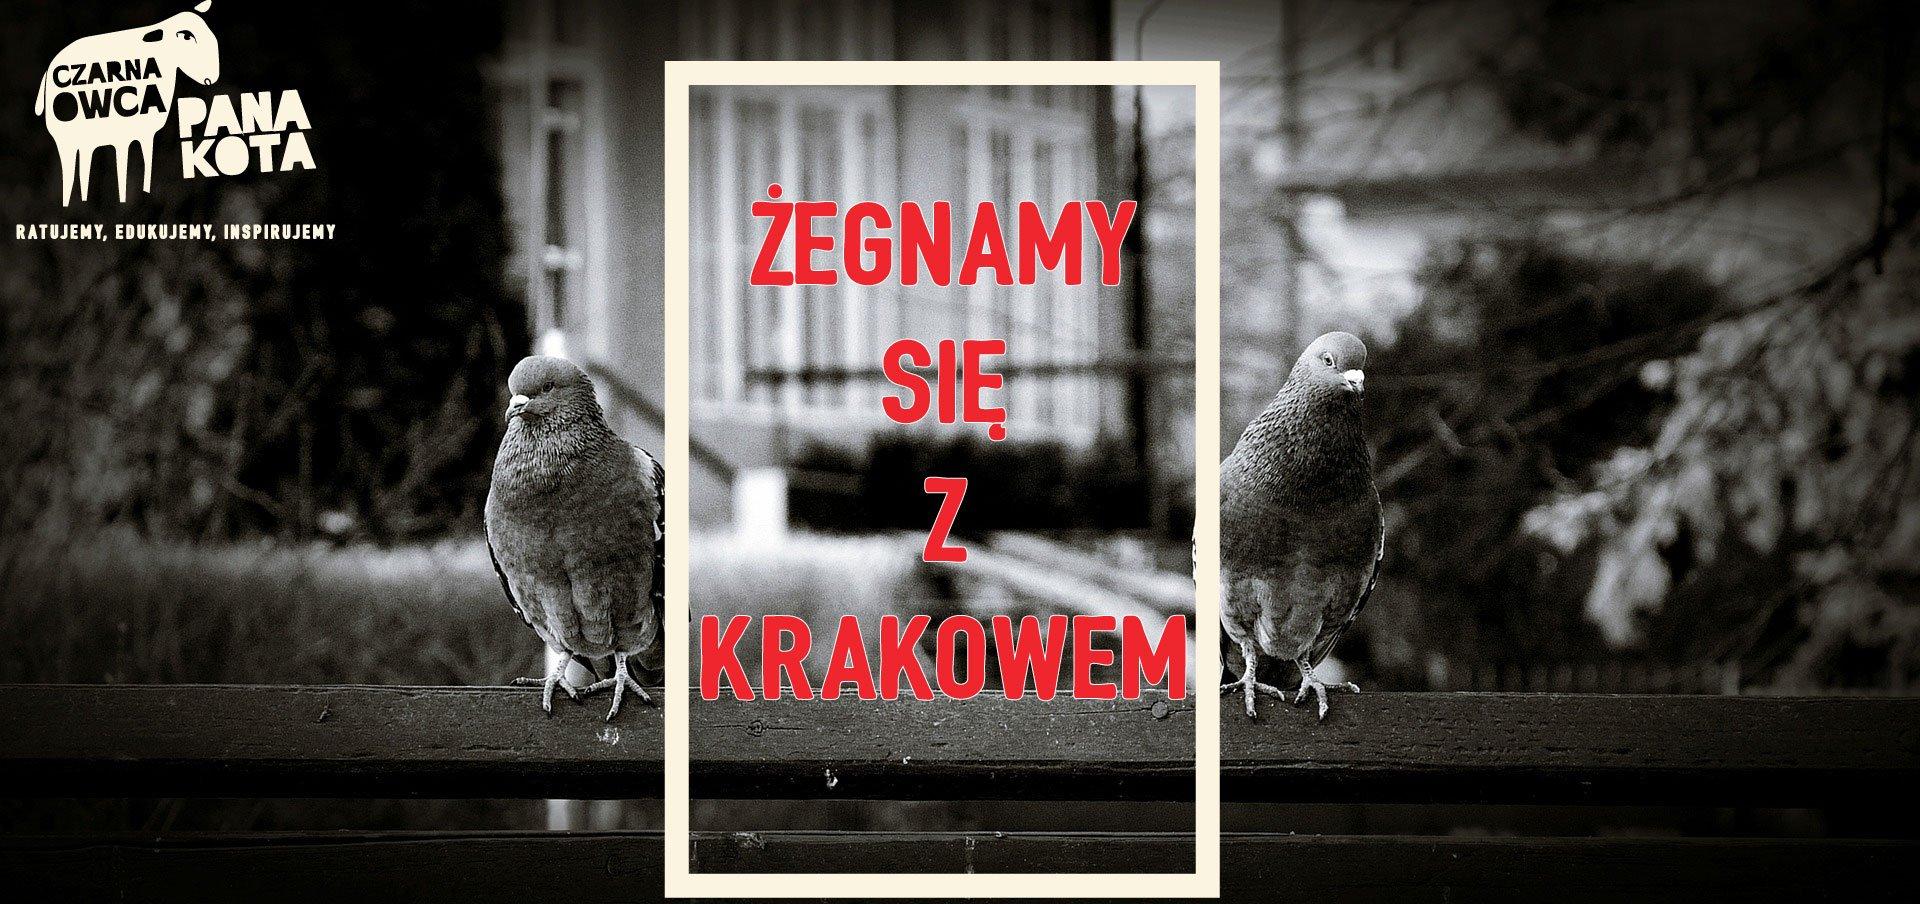 Czarna Owca Pana Kota żegna się z Krakowem